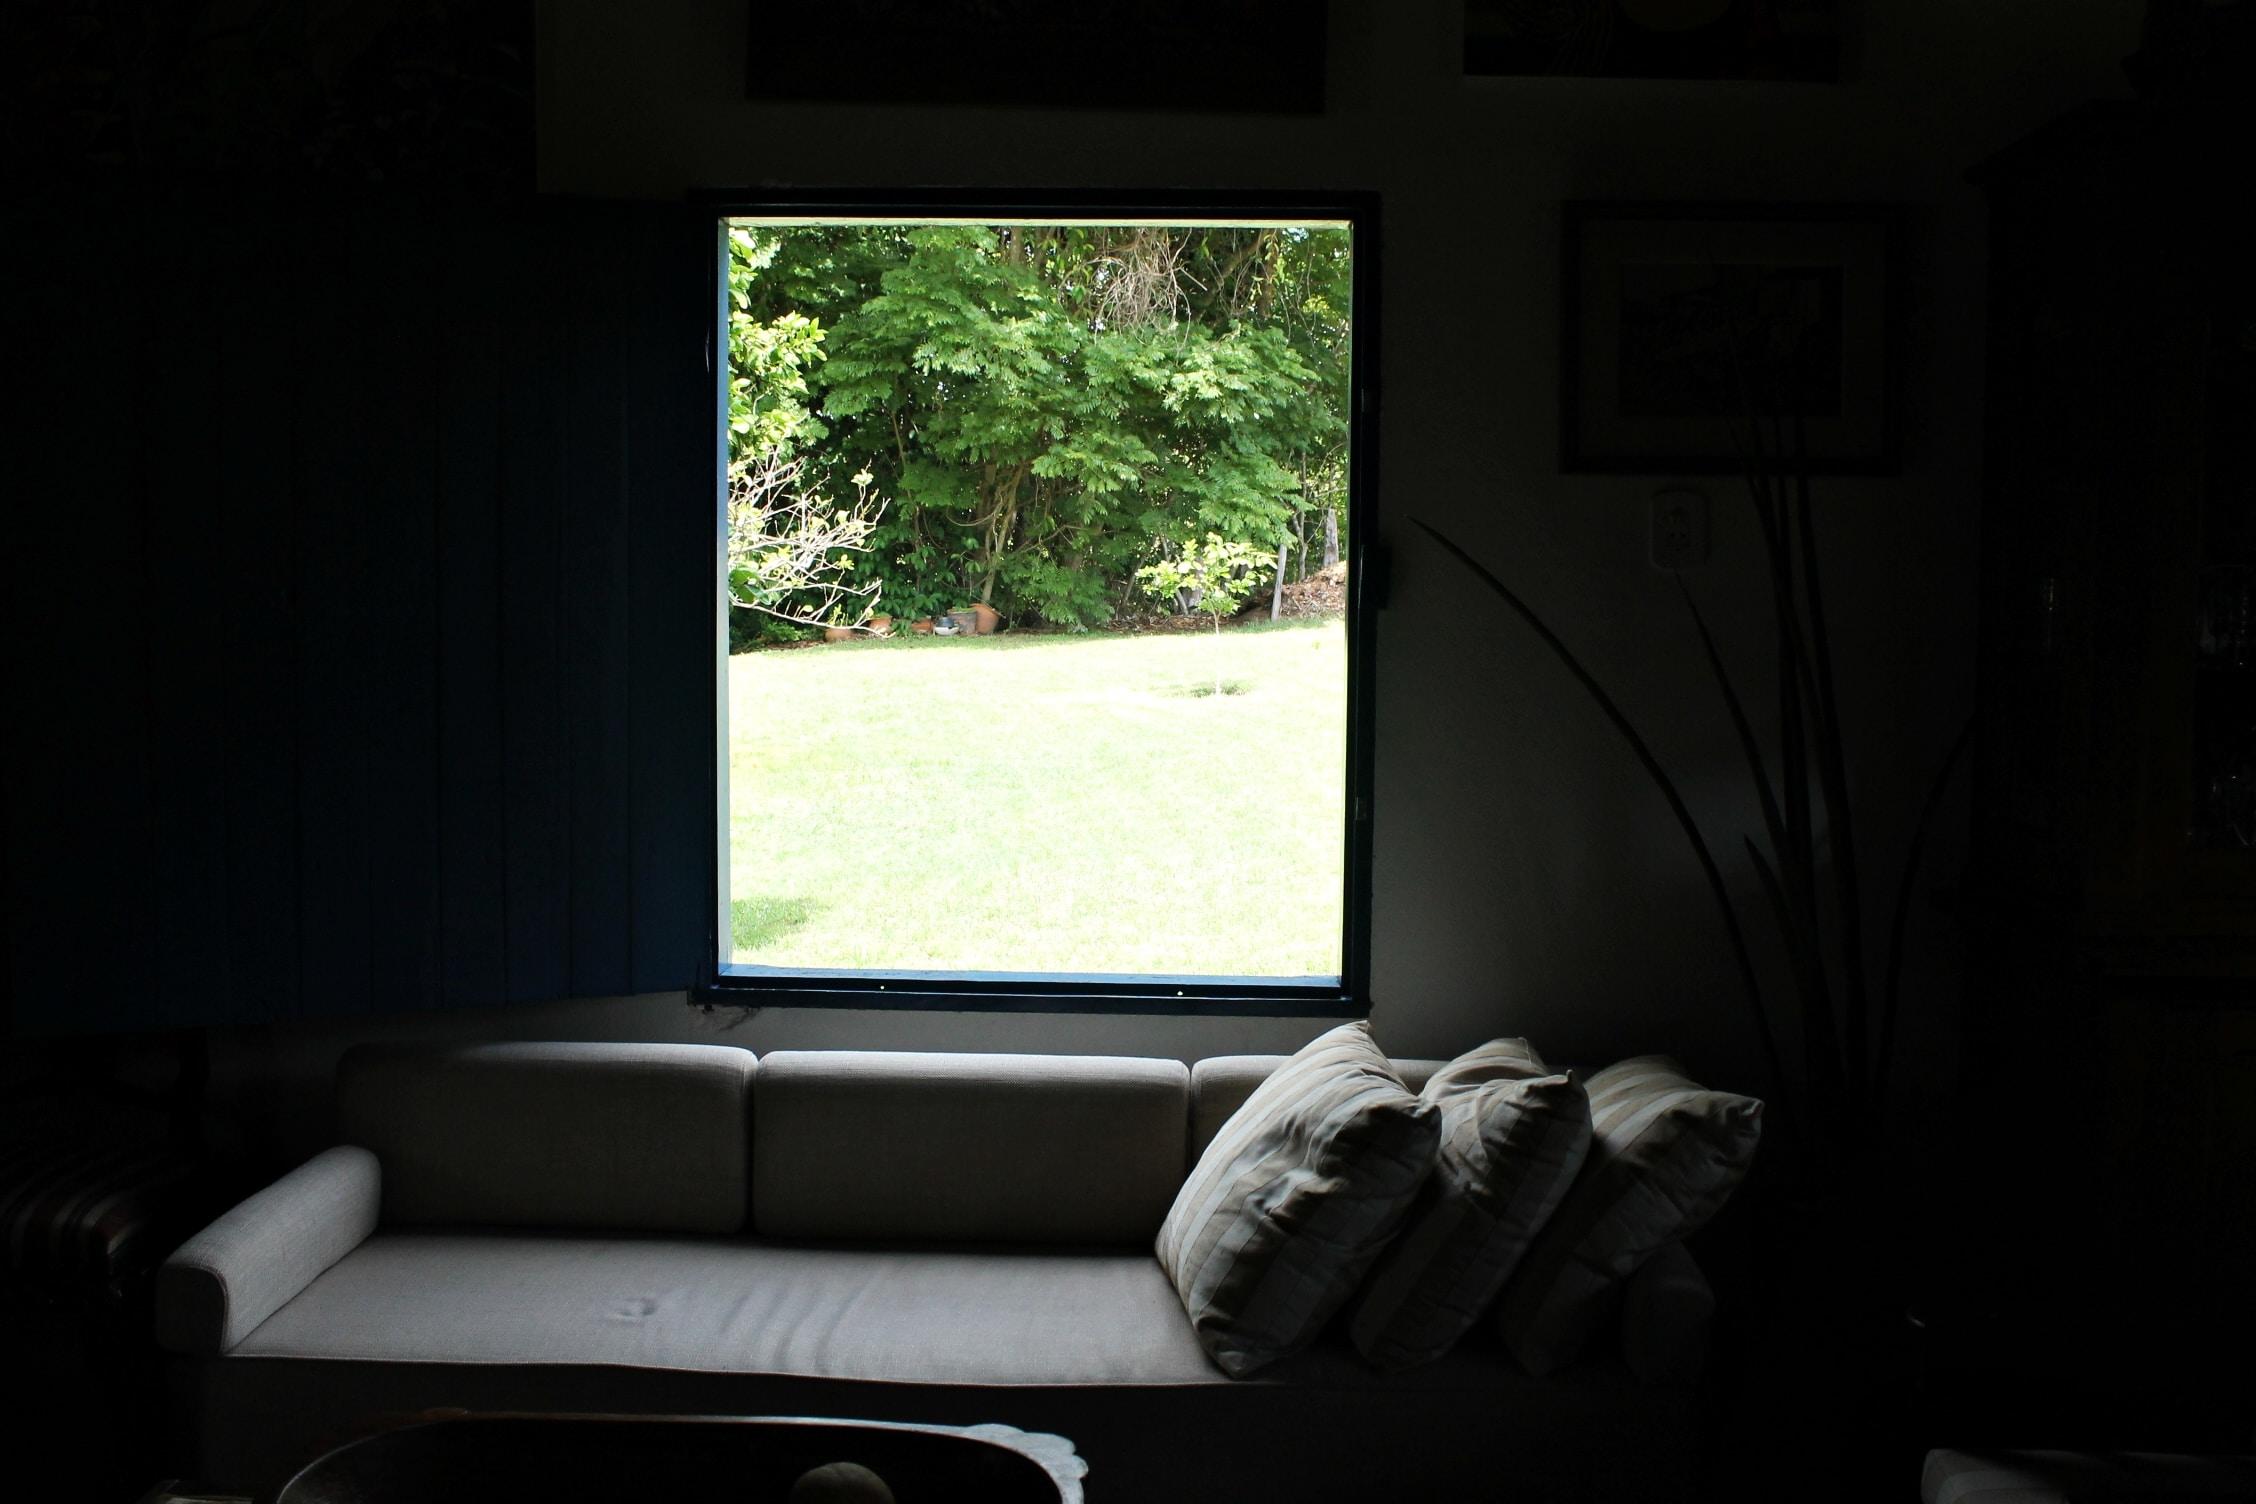 gray sofa inside room